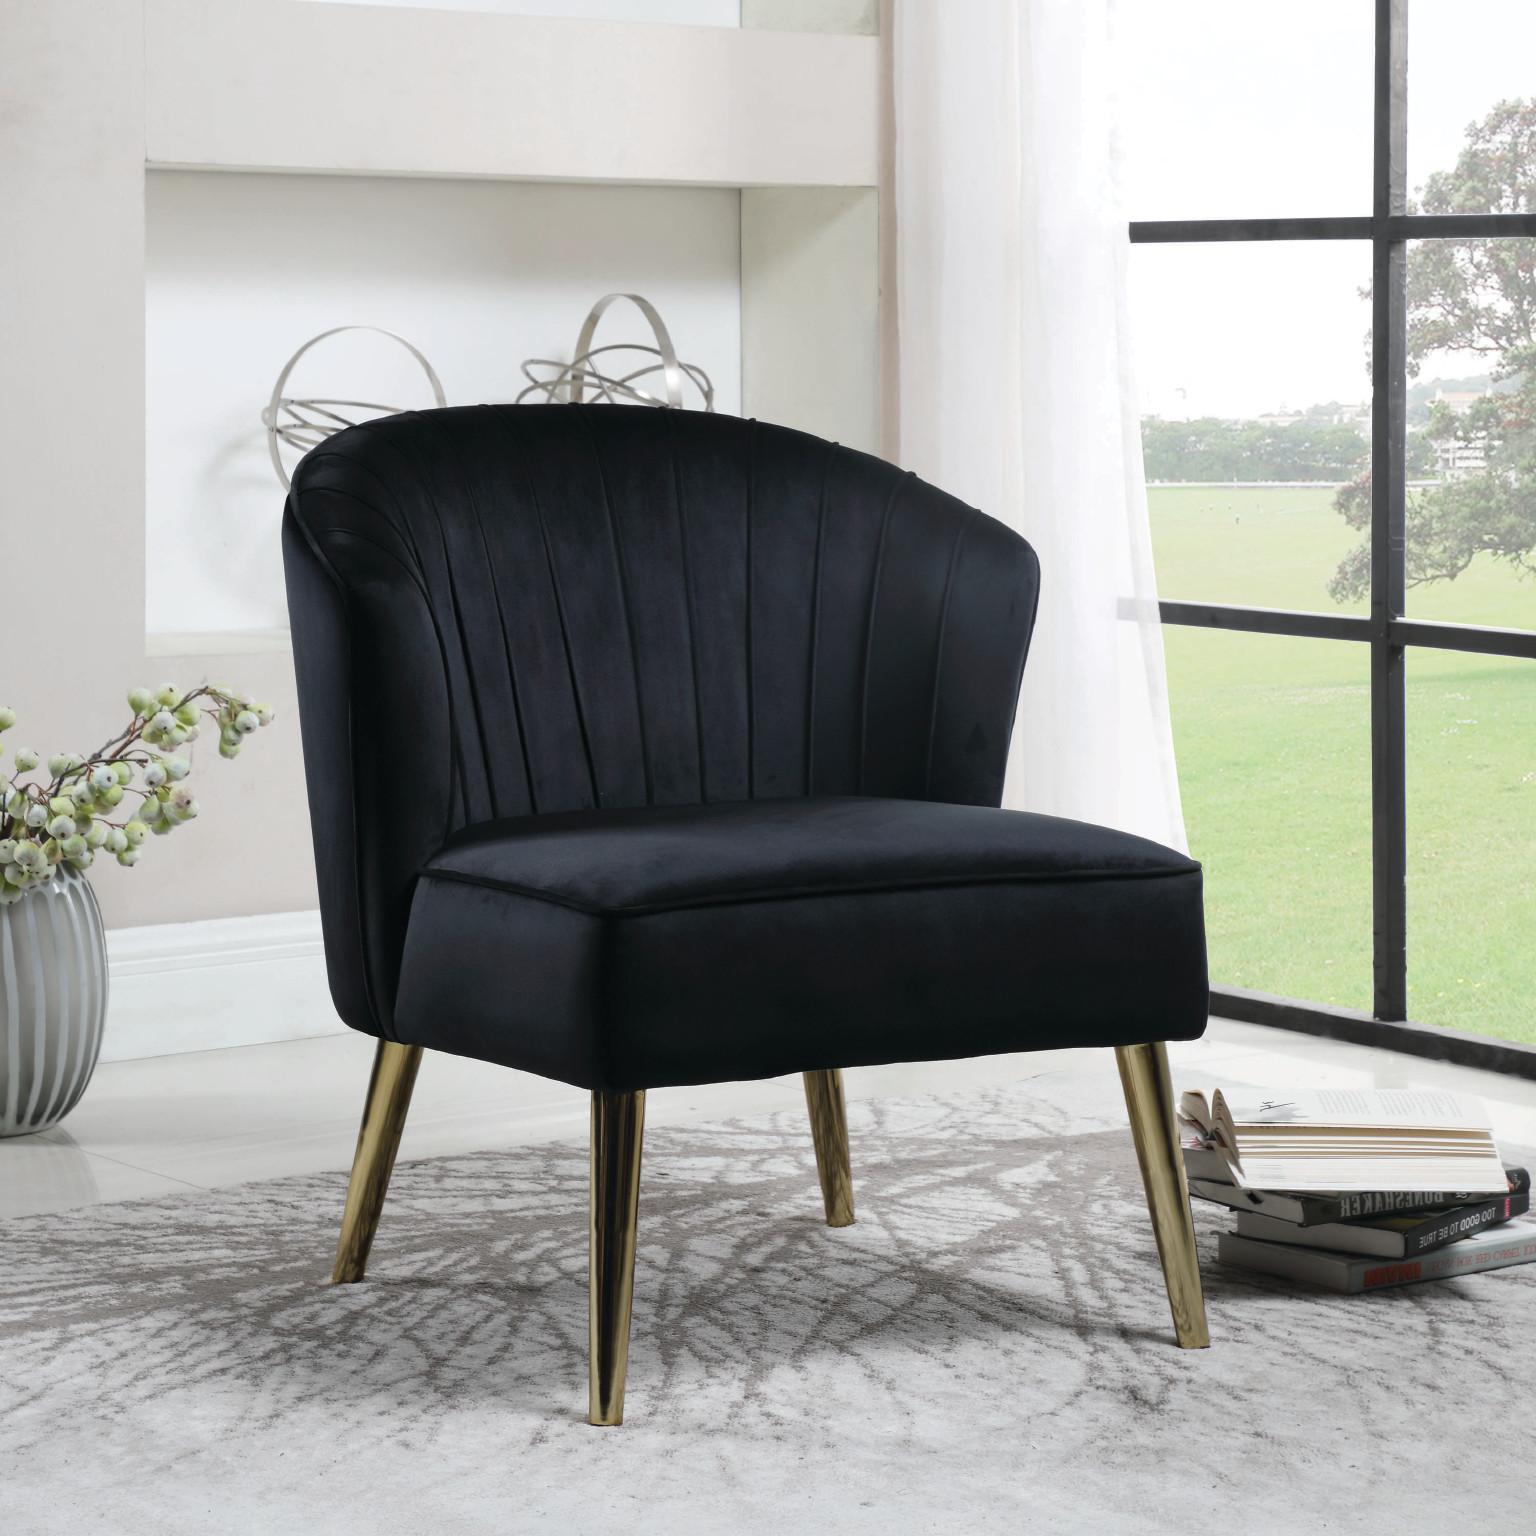 Cosem Black Velvet Accent Chair | Las Vegas Furniture ...